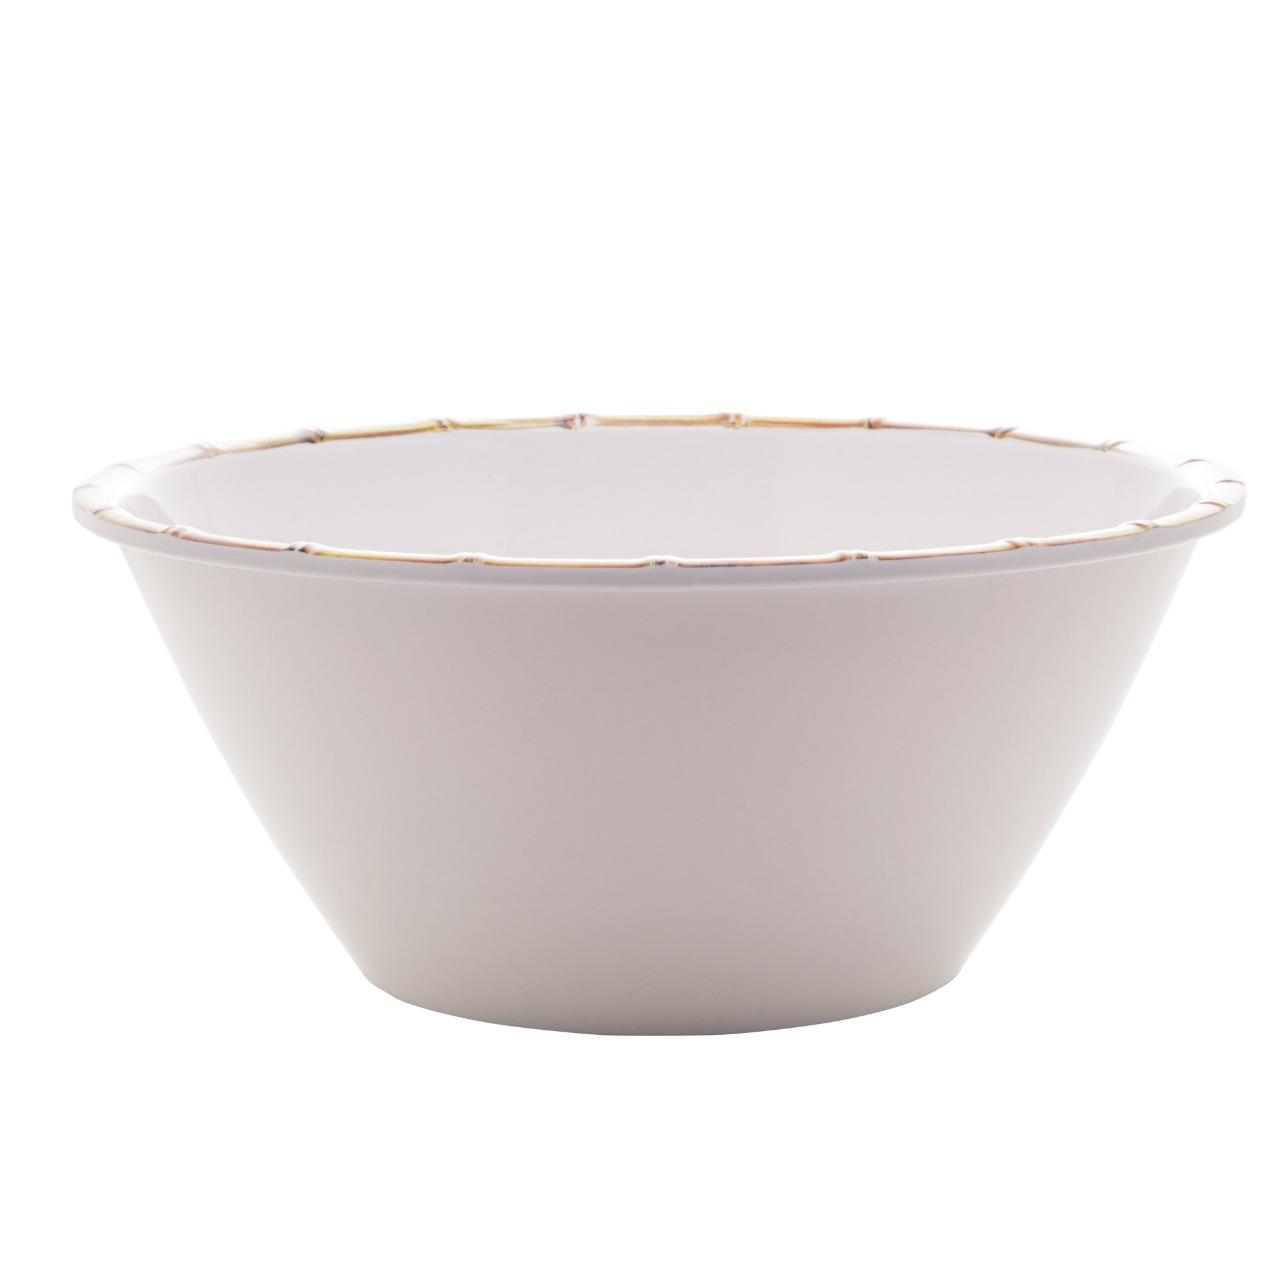 Saladeira Melamina Bambu Branco - Bon Gourmet